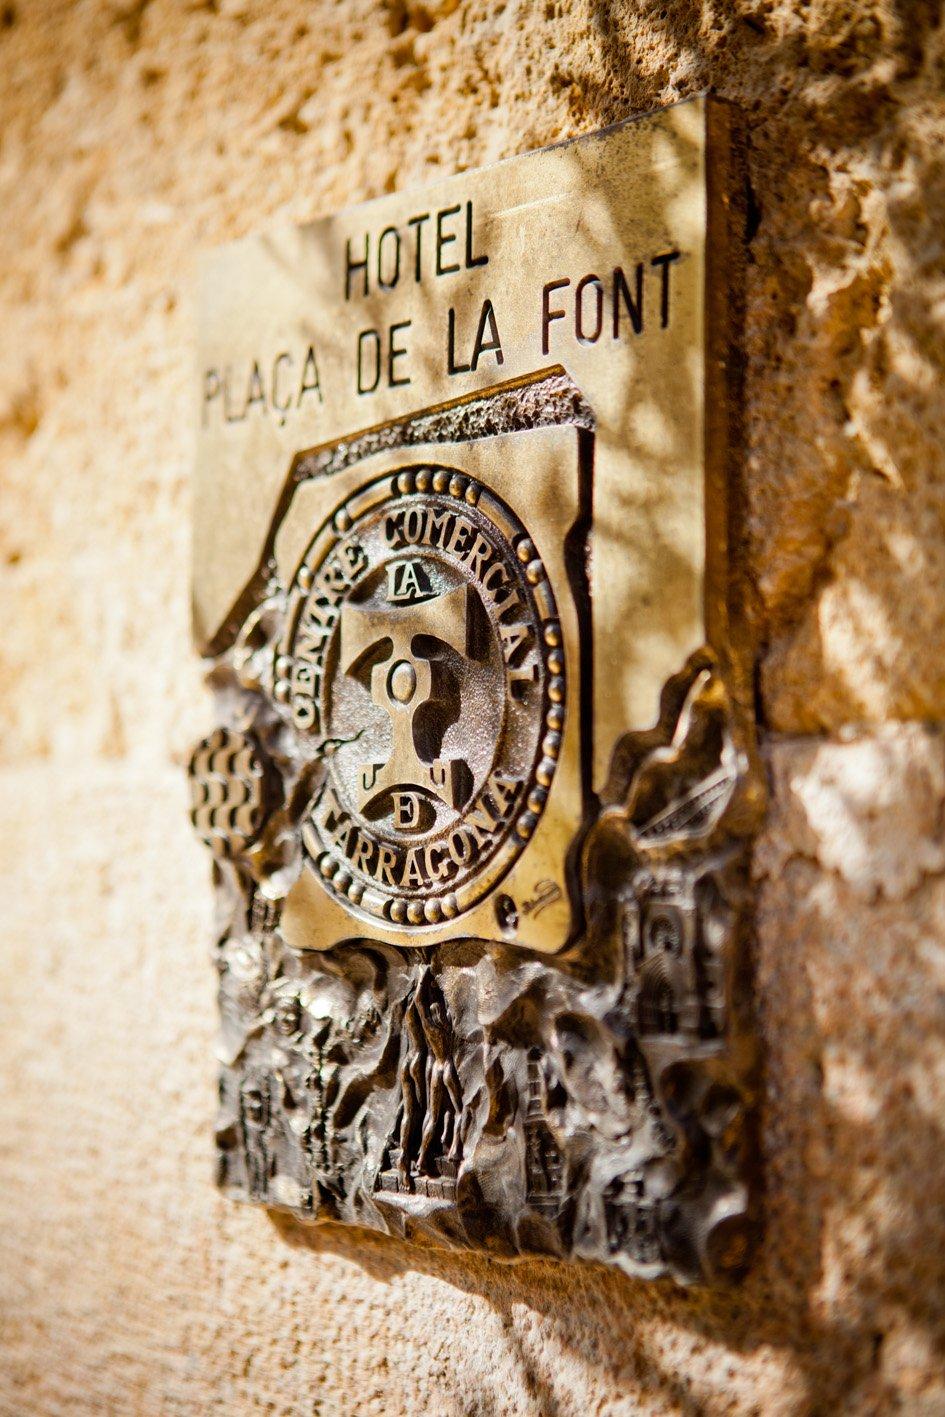 hotel_la_fontnombre_del_documento_13-a48f23d0800de3f7462c686ef4c521ae